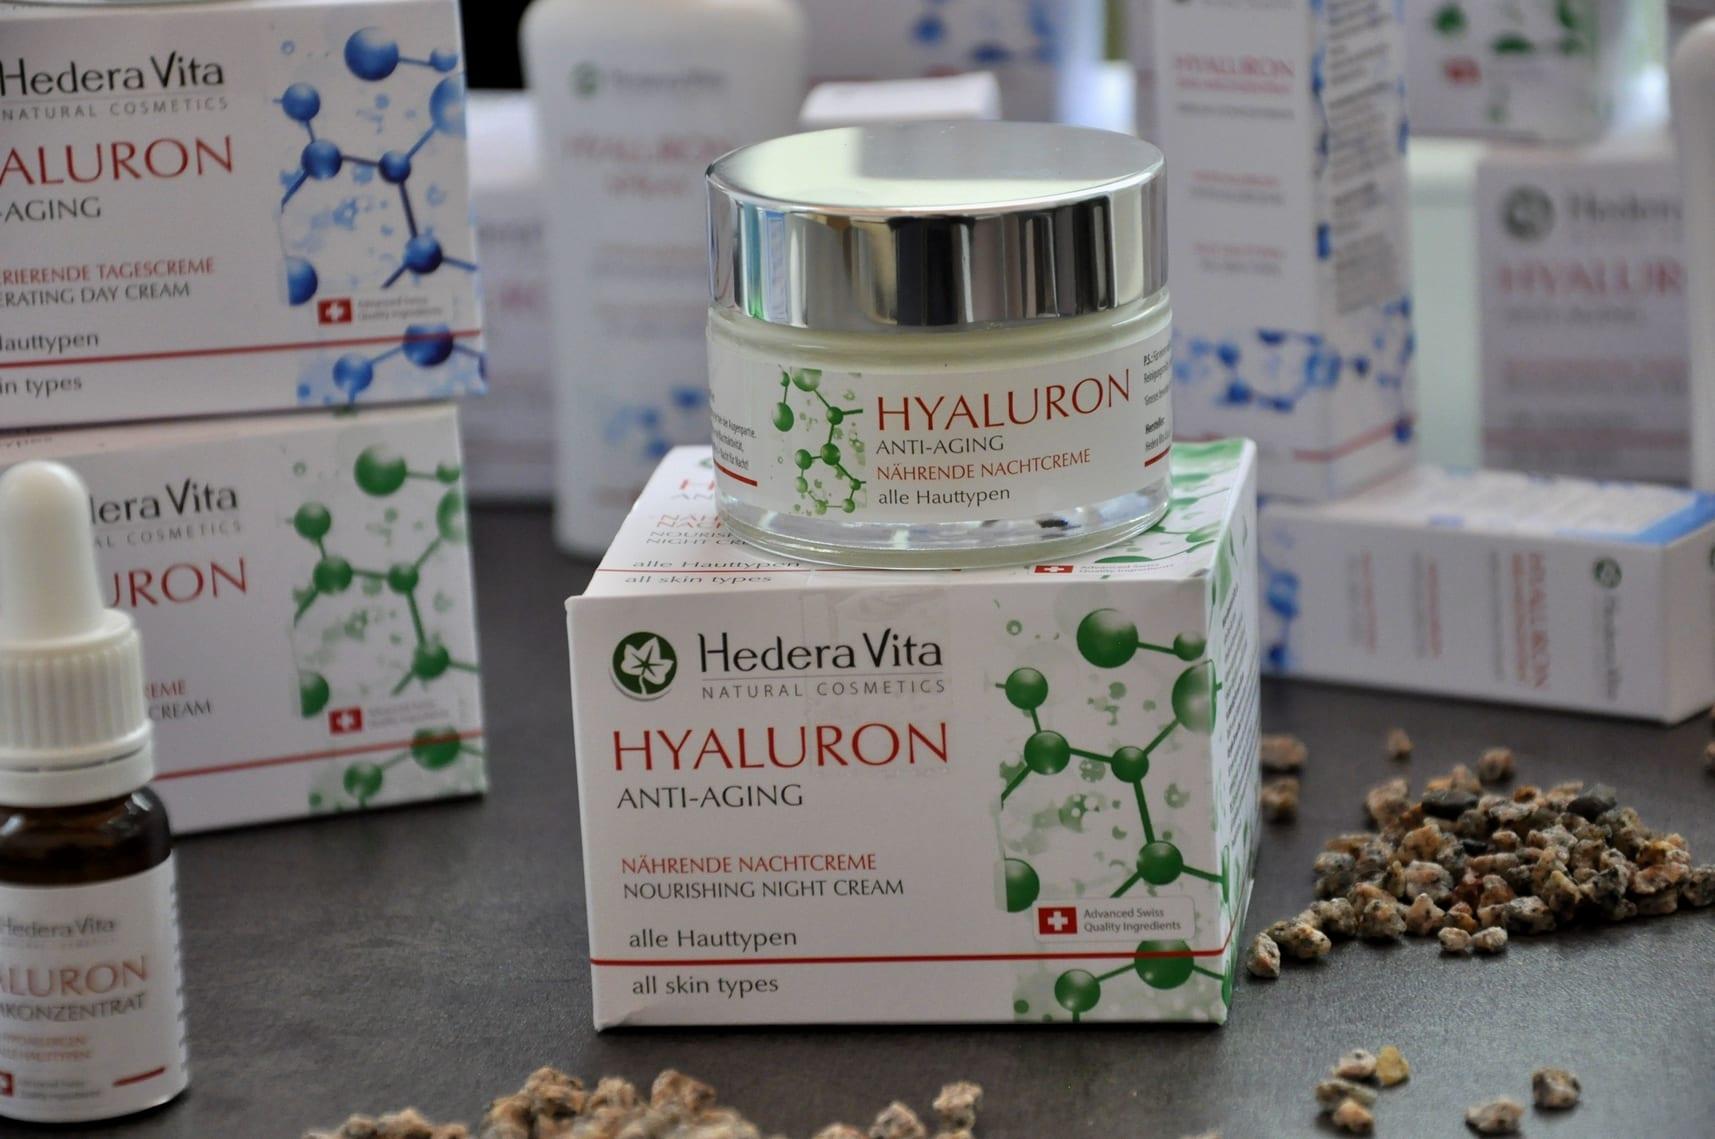 Hyaluron Anti-Aging Nachtcreme